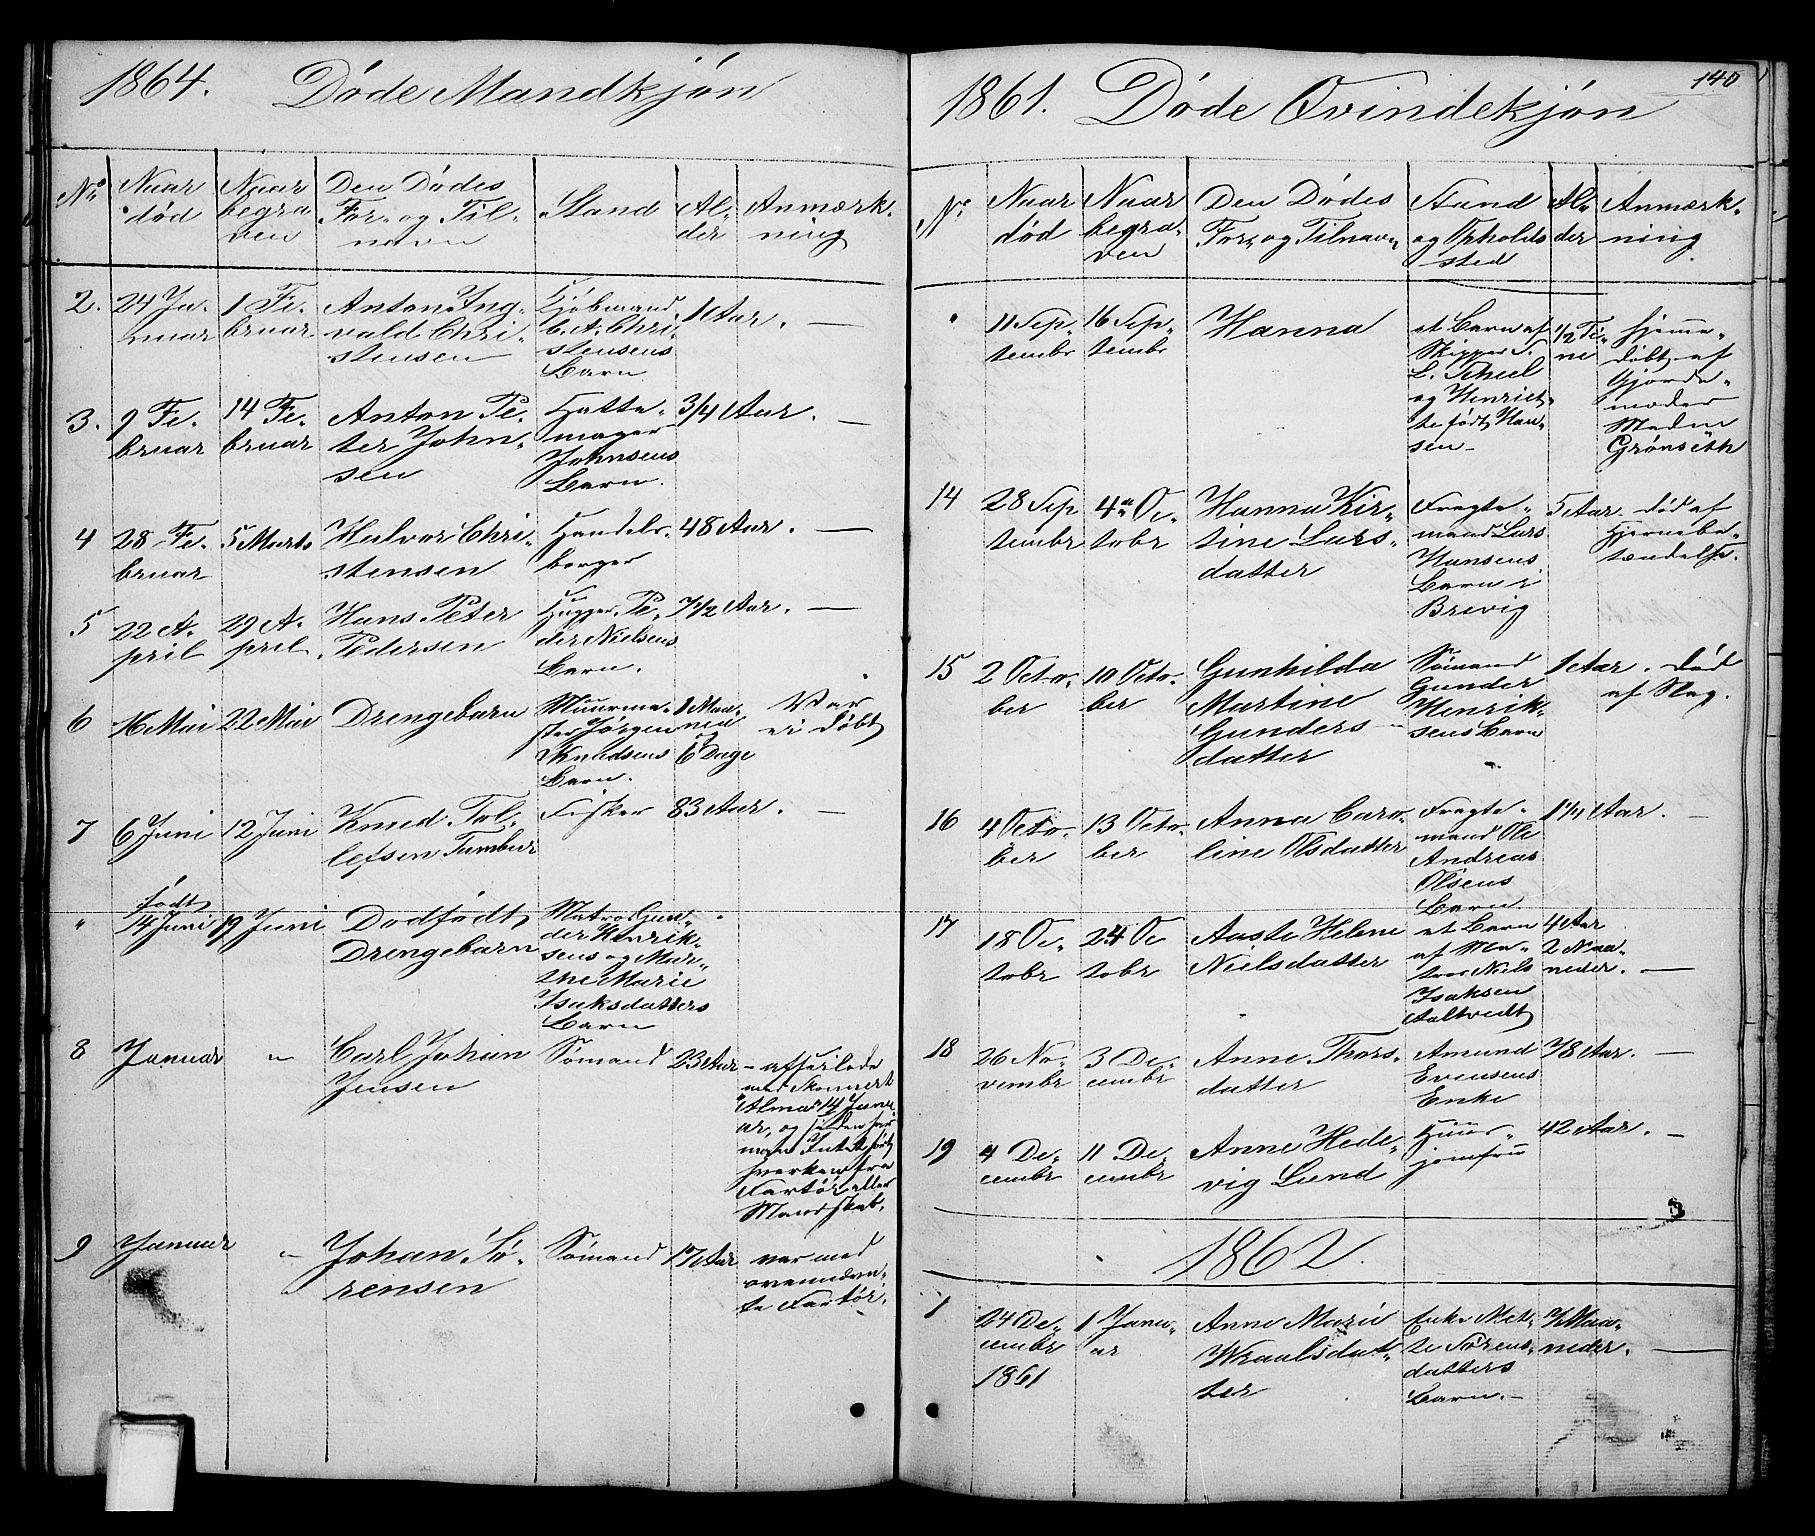 SAKO, Brevik kirkebøker, G/Ga/L0002: Klokkerbok nr. 2, 1846-1865, s. 140